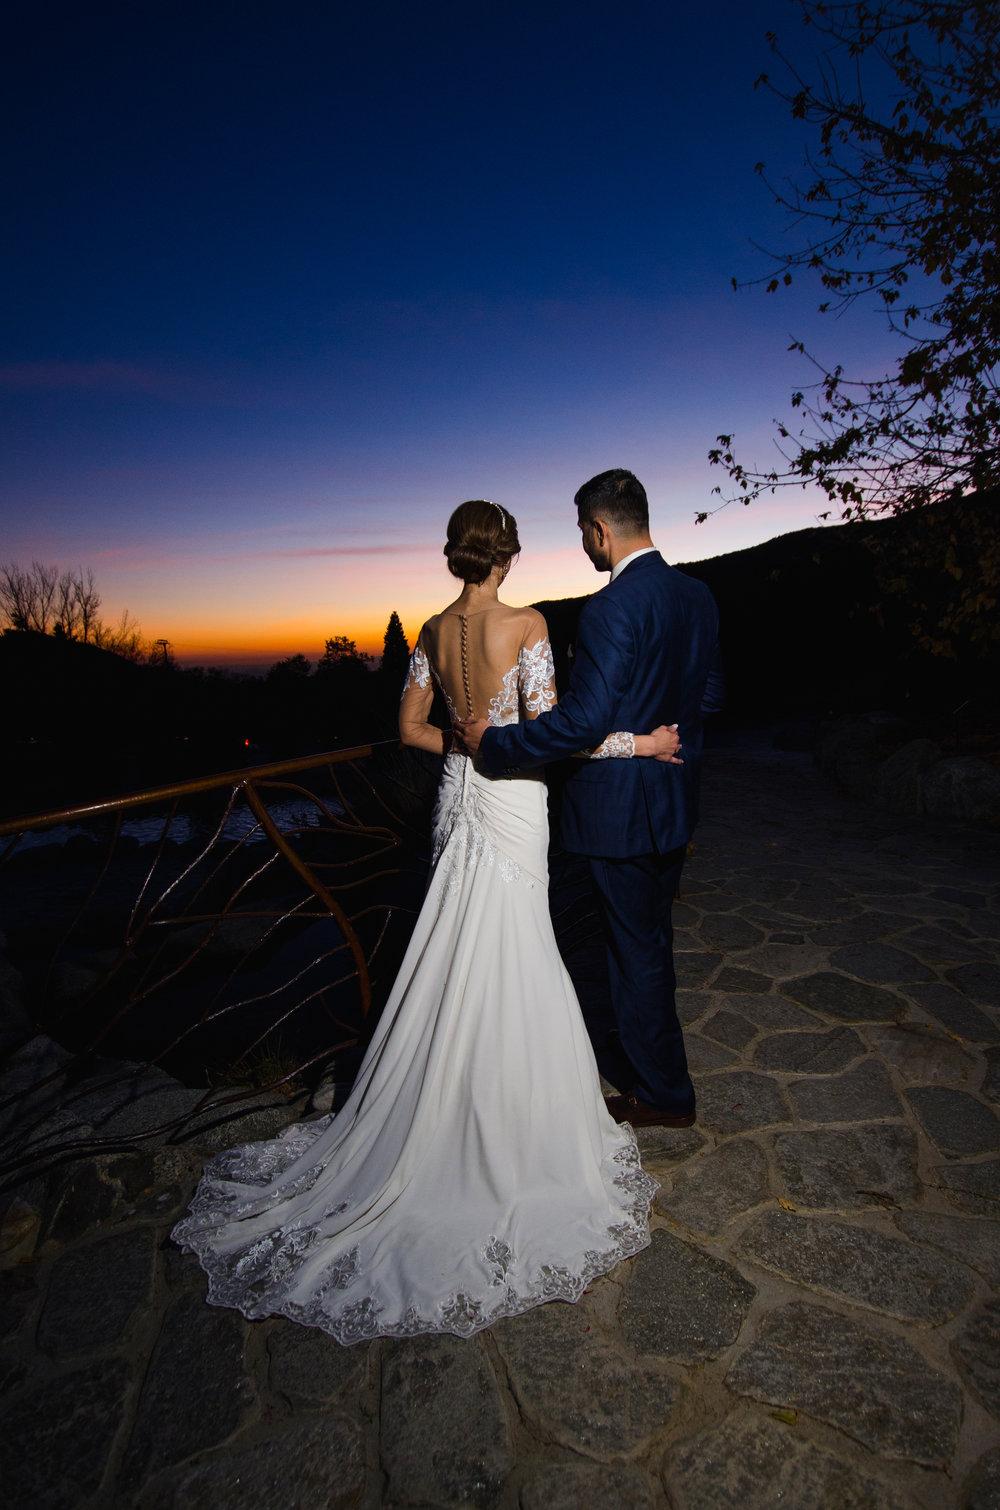 Jenn&Luis Wed_ Rec_MarcialPhoto-17.jpg